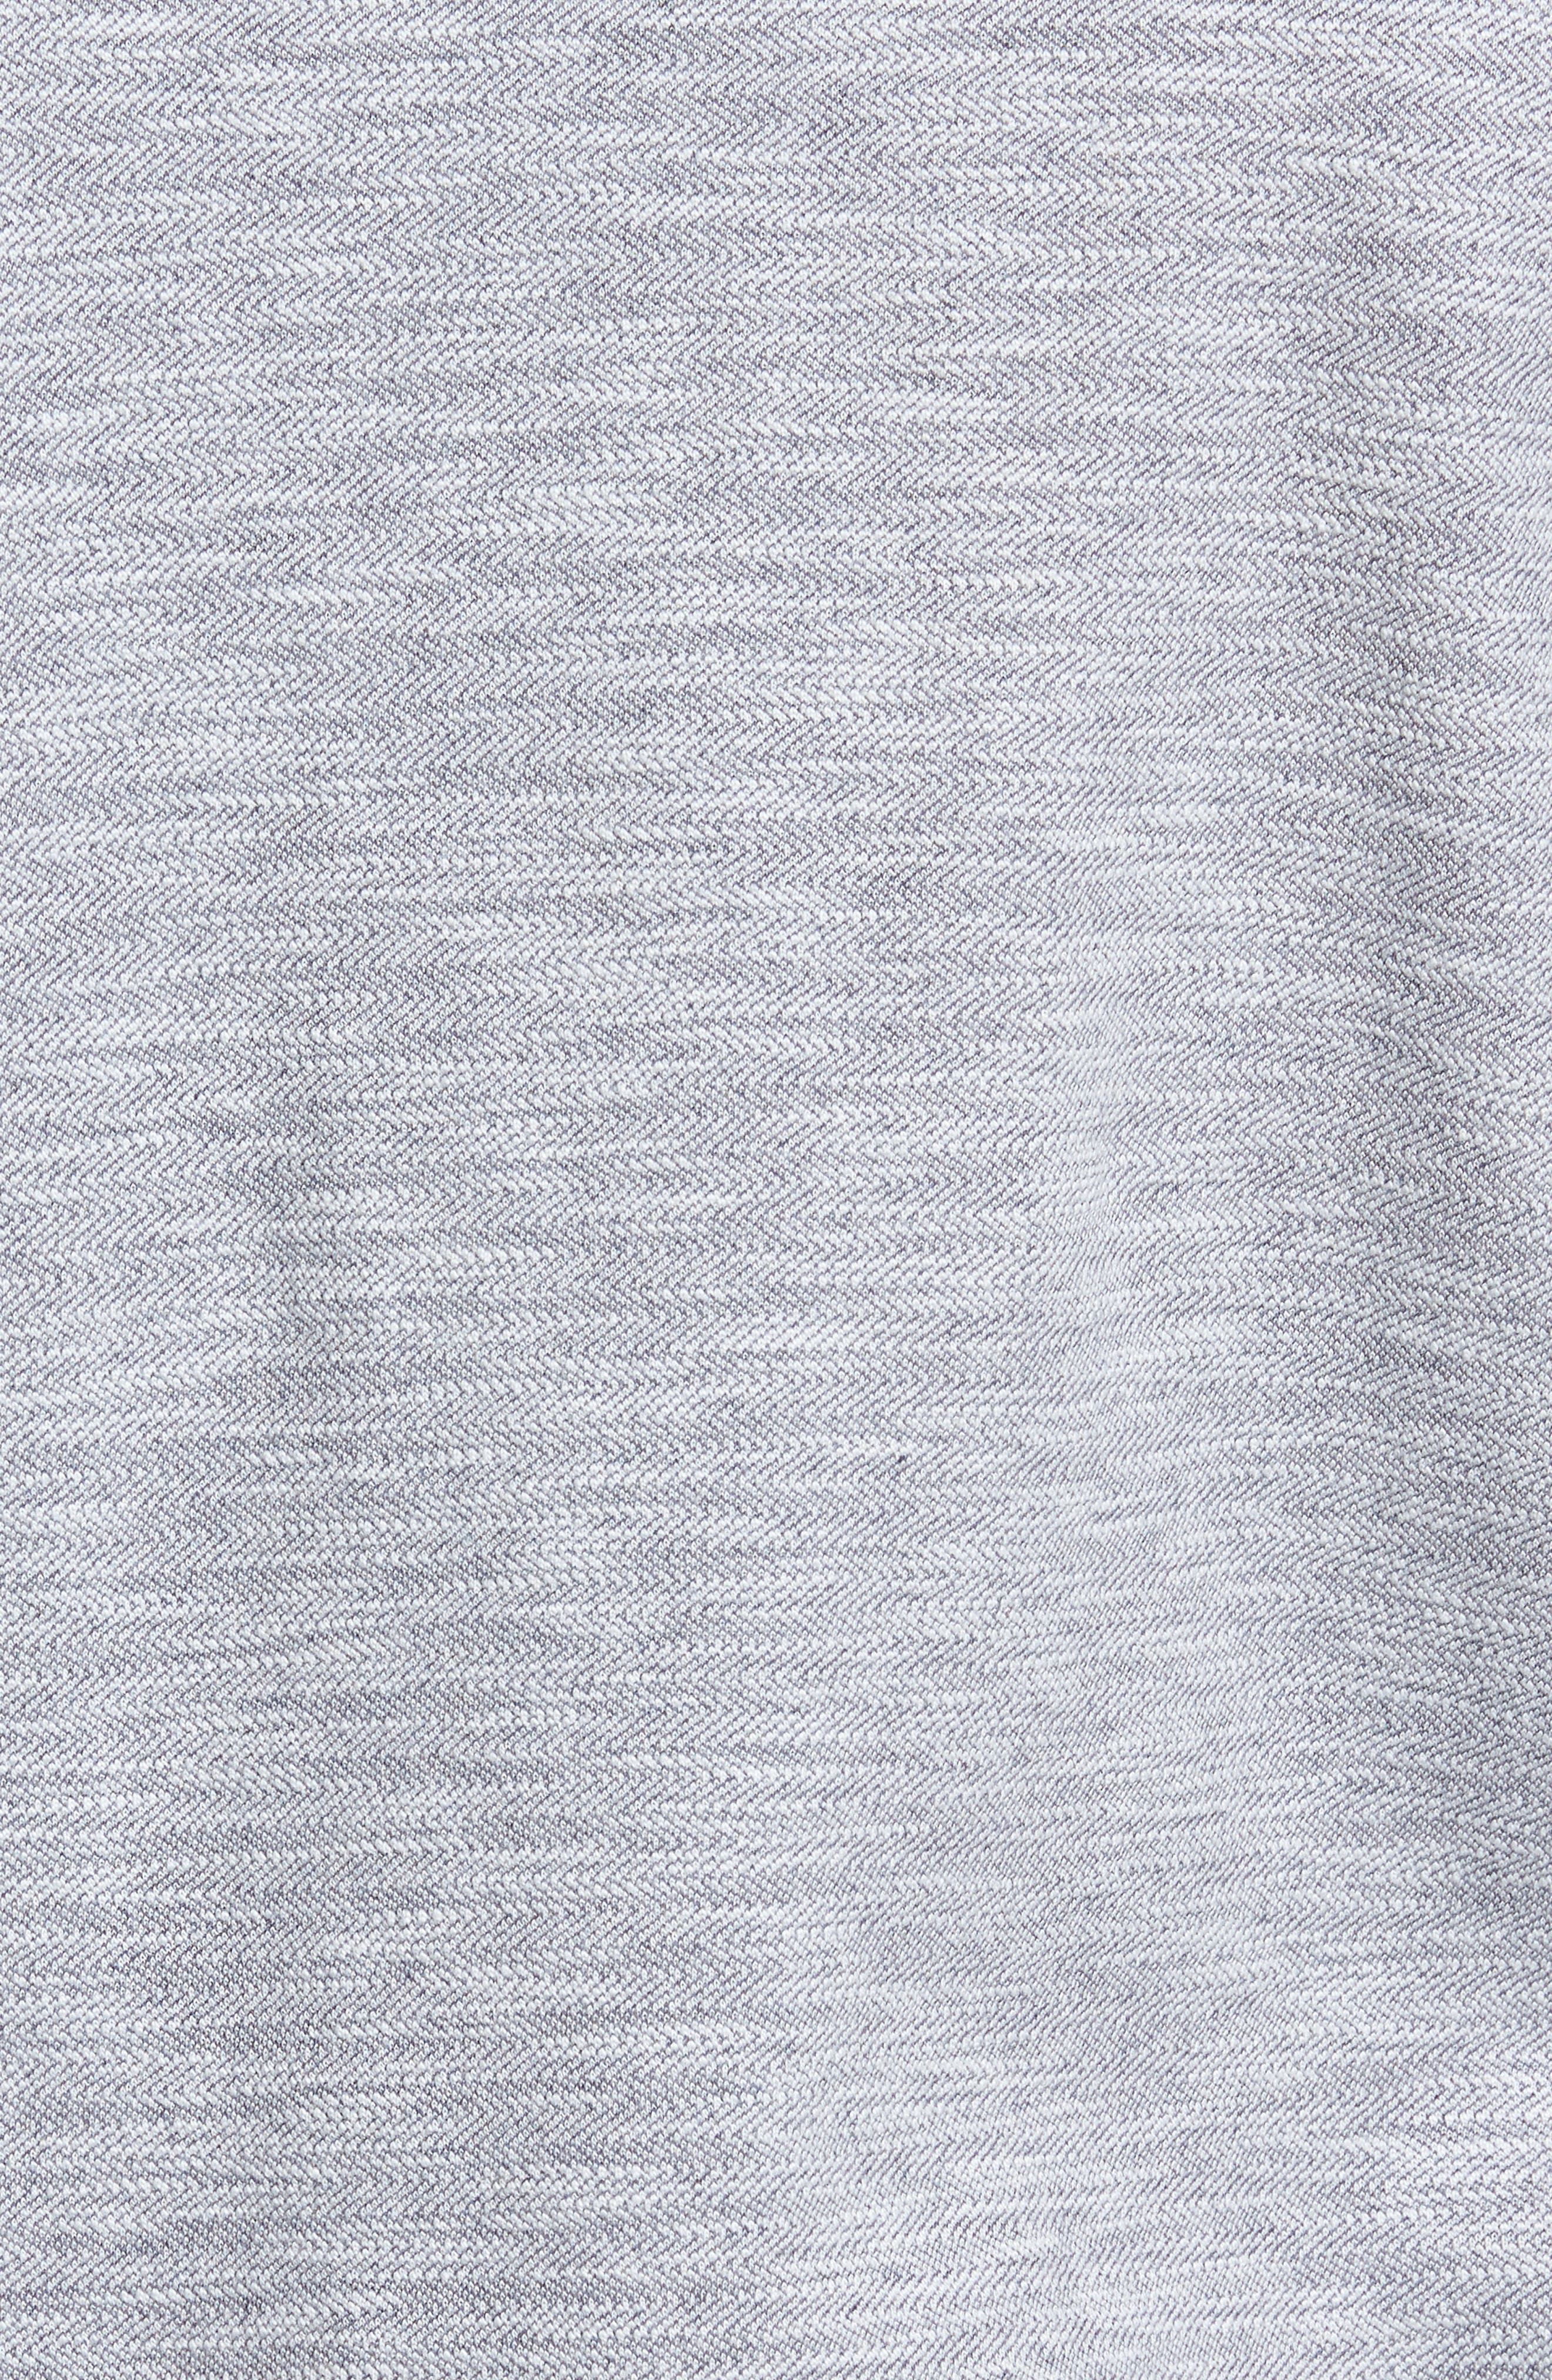 Alternate Image 5  - Tommy Bahama Sandbar Slub Reversible Quarter Zip Pullover